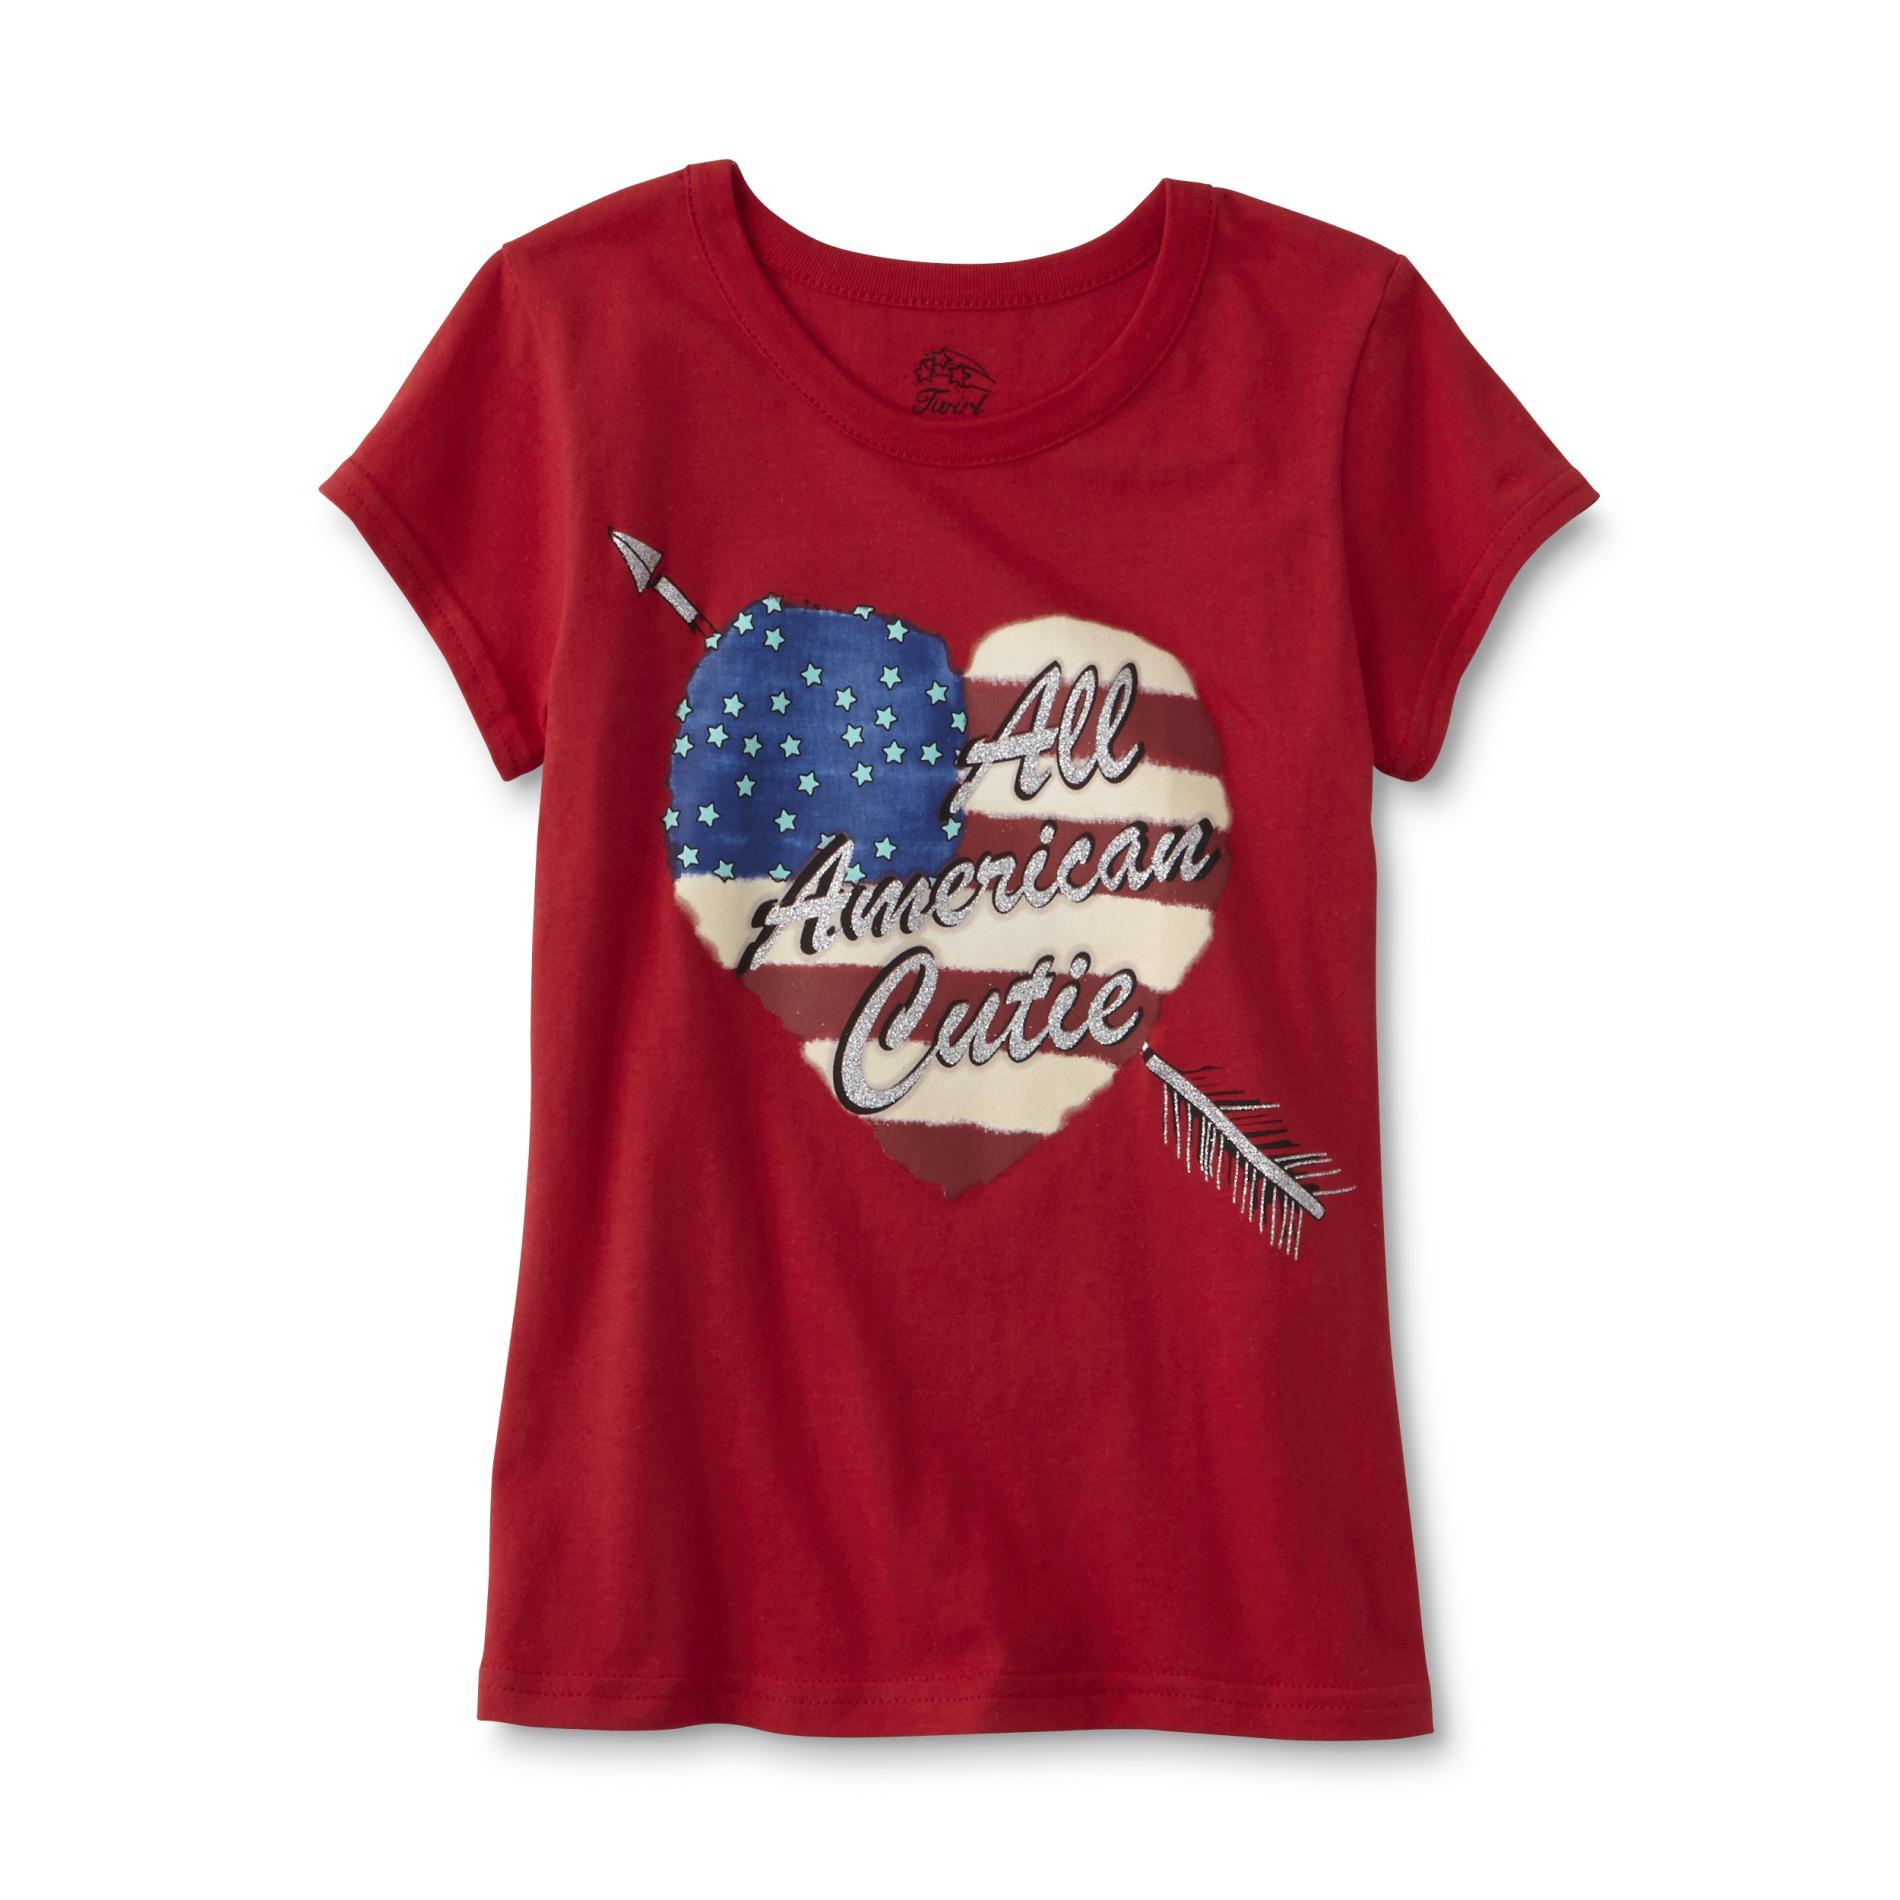 Girl's Graphic T-Shirt - American Cutie